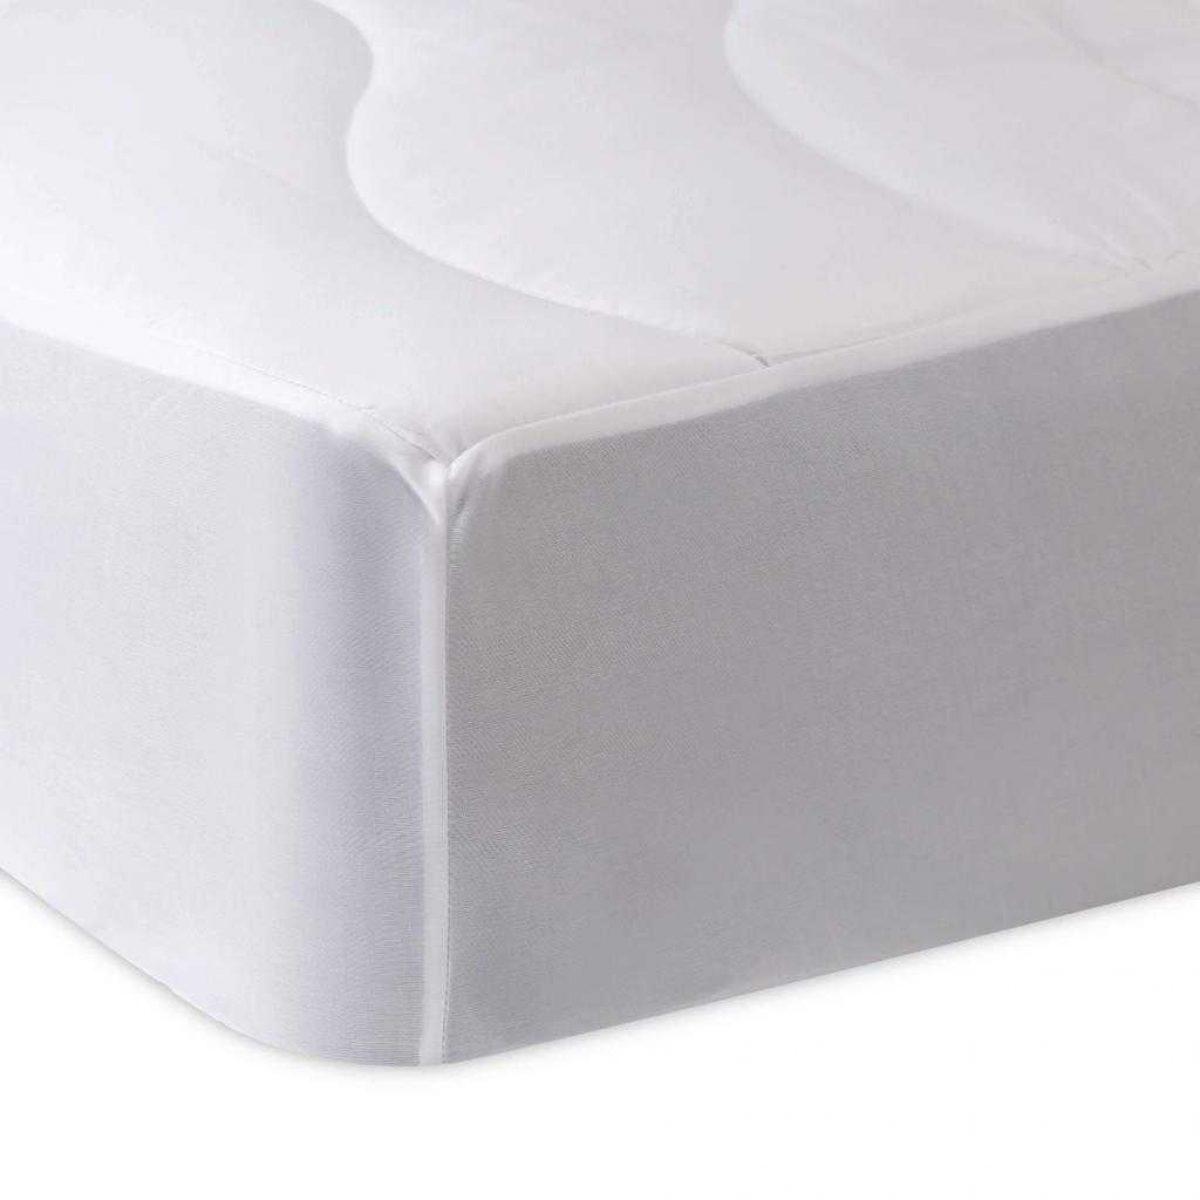 Fine Bedding Spundown Mattress Protector 1024x1024